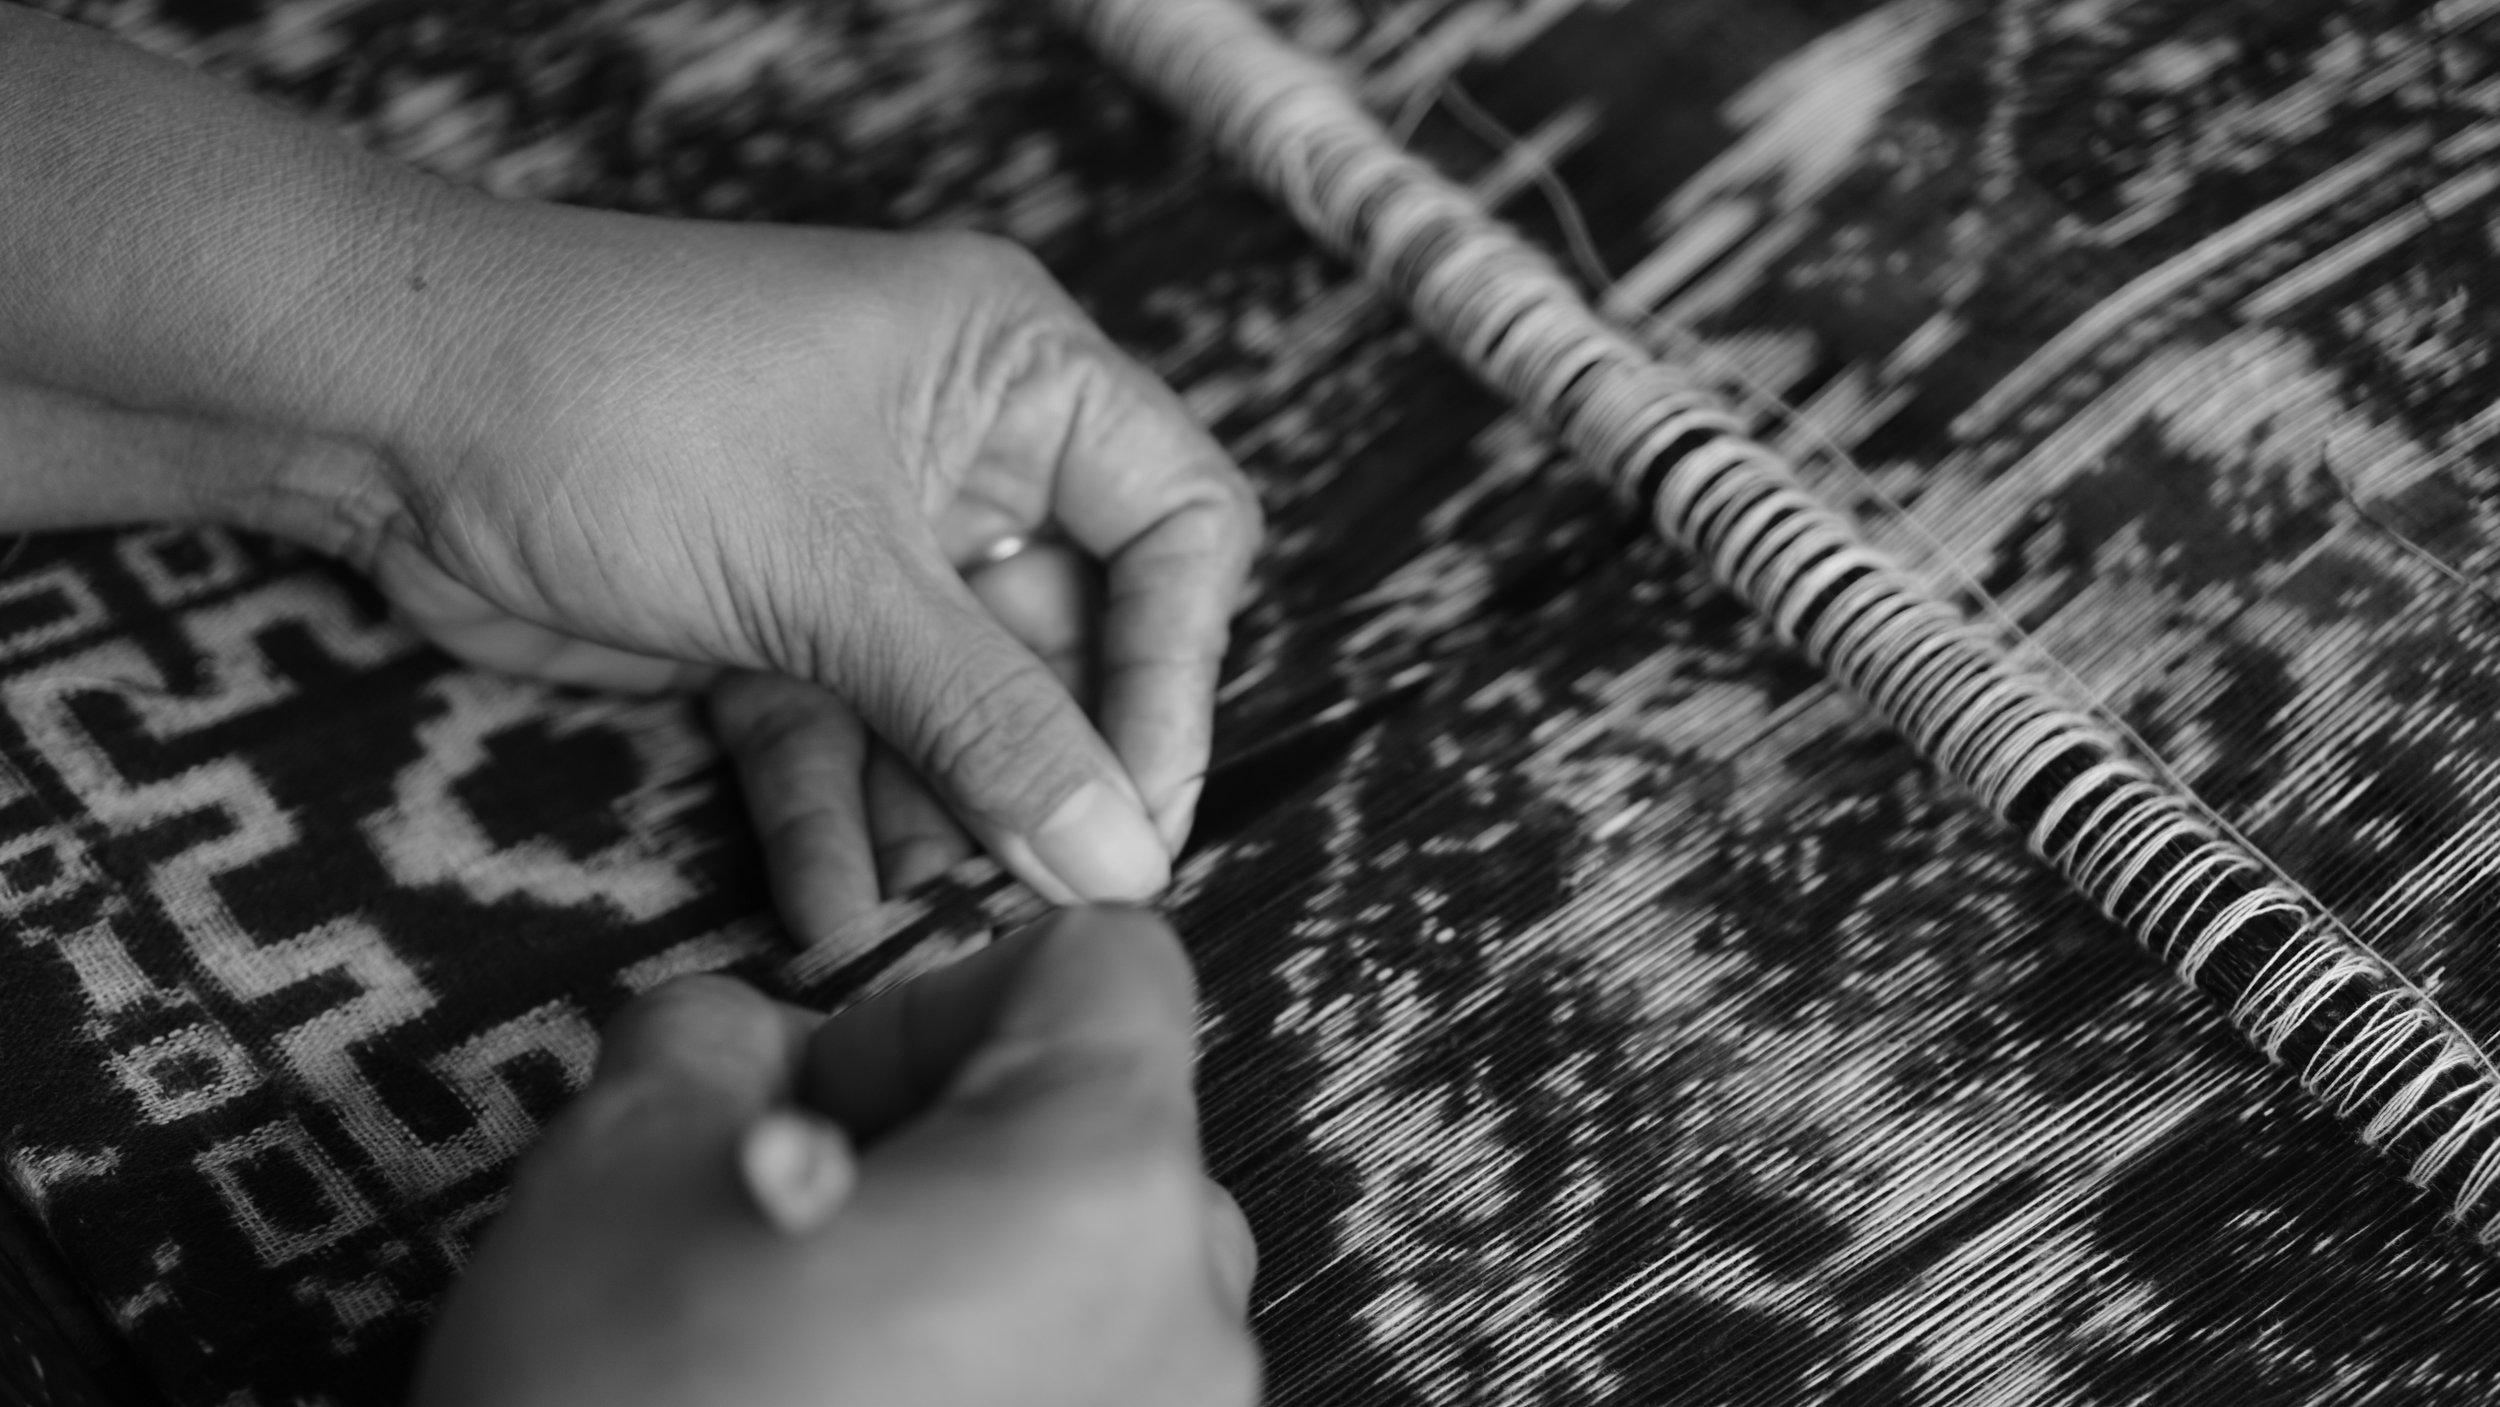 Weaving Demos - With Debbie Turner, Sandy Clark Kolaks and Katarina Koch